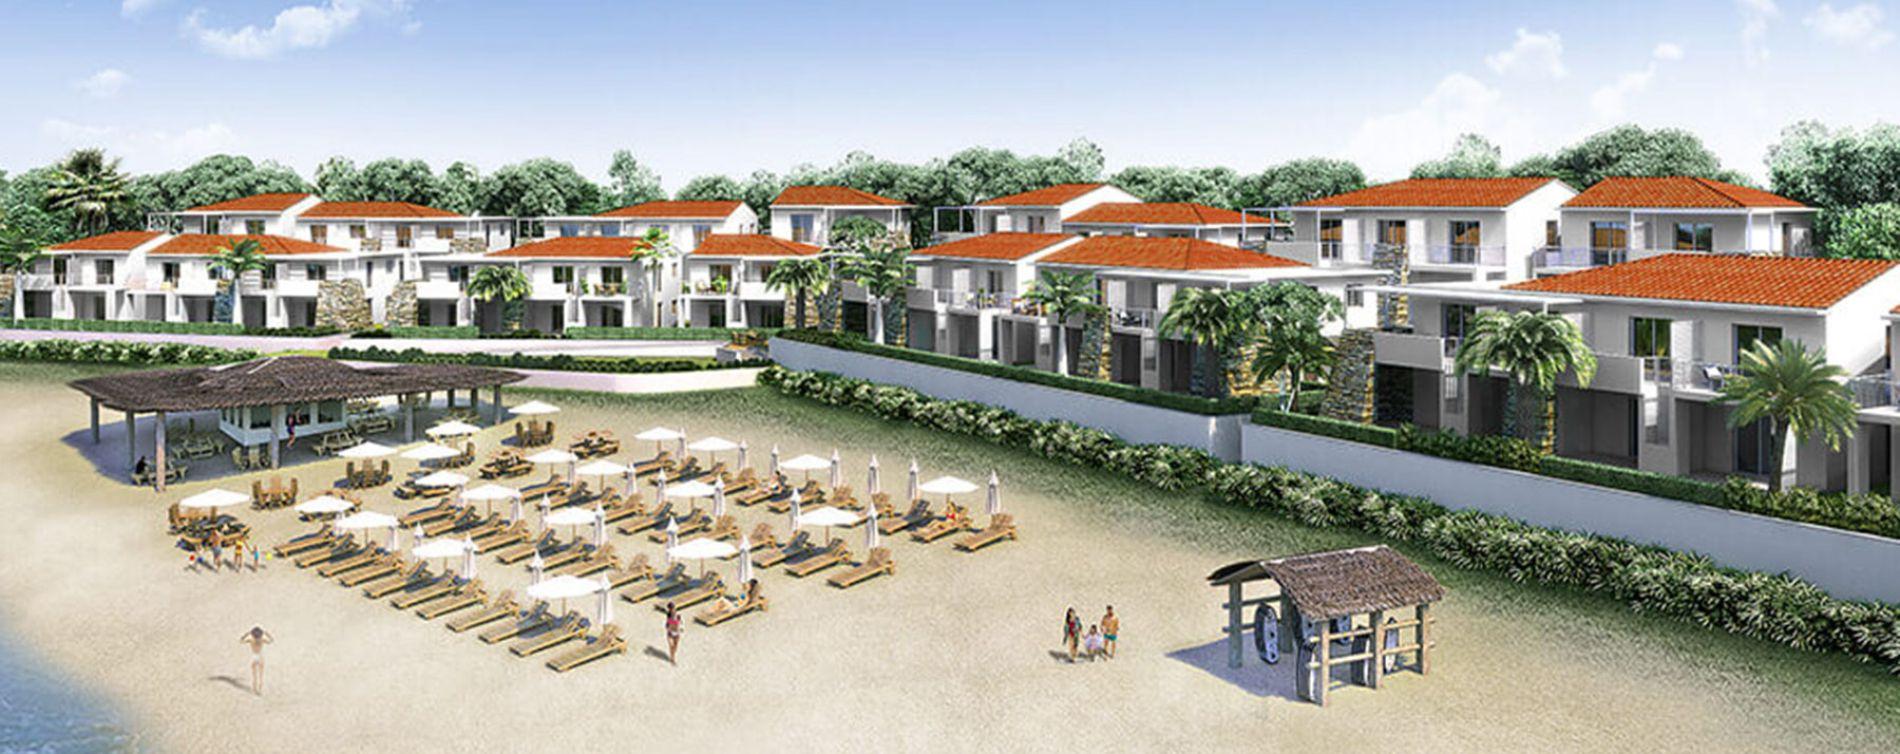 Linguizzetta : programme immobilier neuve « Marina Di Bravone » (3)